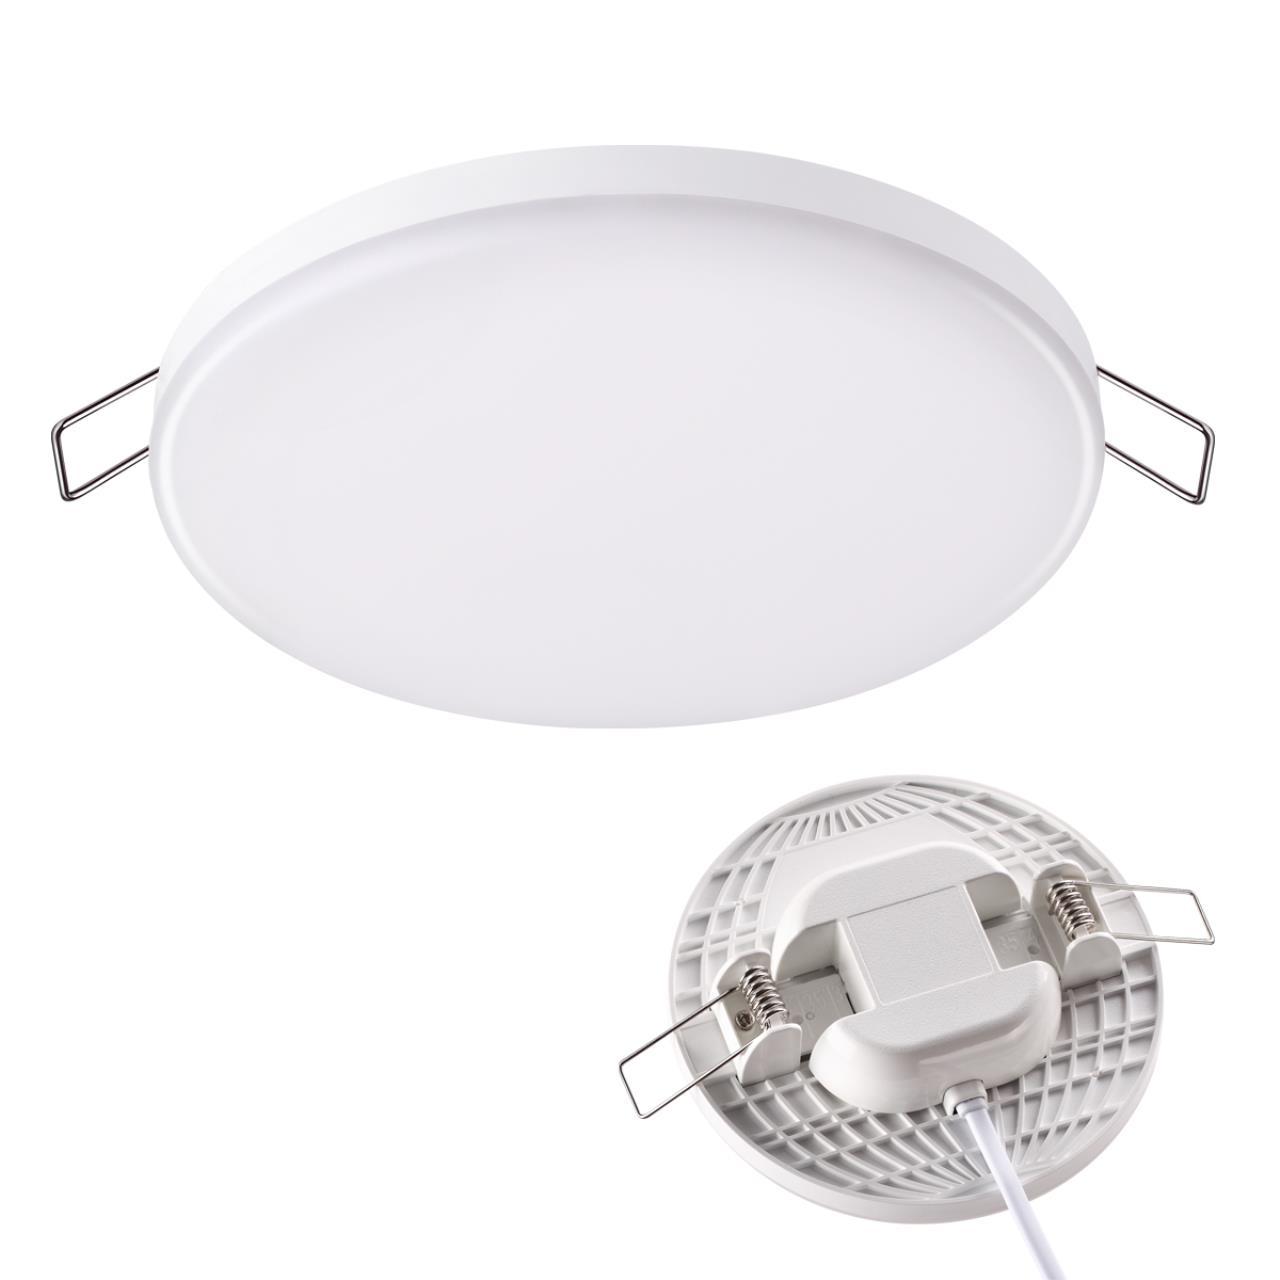 358141 SPOT NT19 078 белый Встраиваемый светильник IP20 LED 3000K 12W 85 - 265V MOON